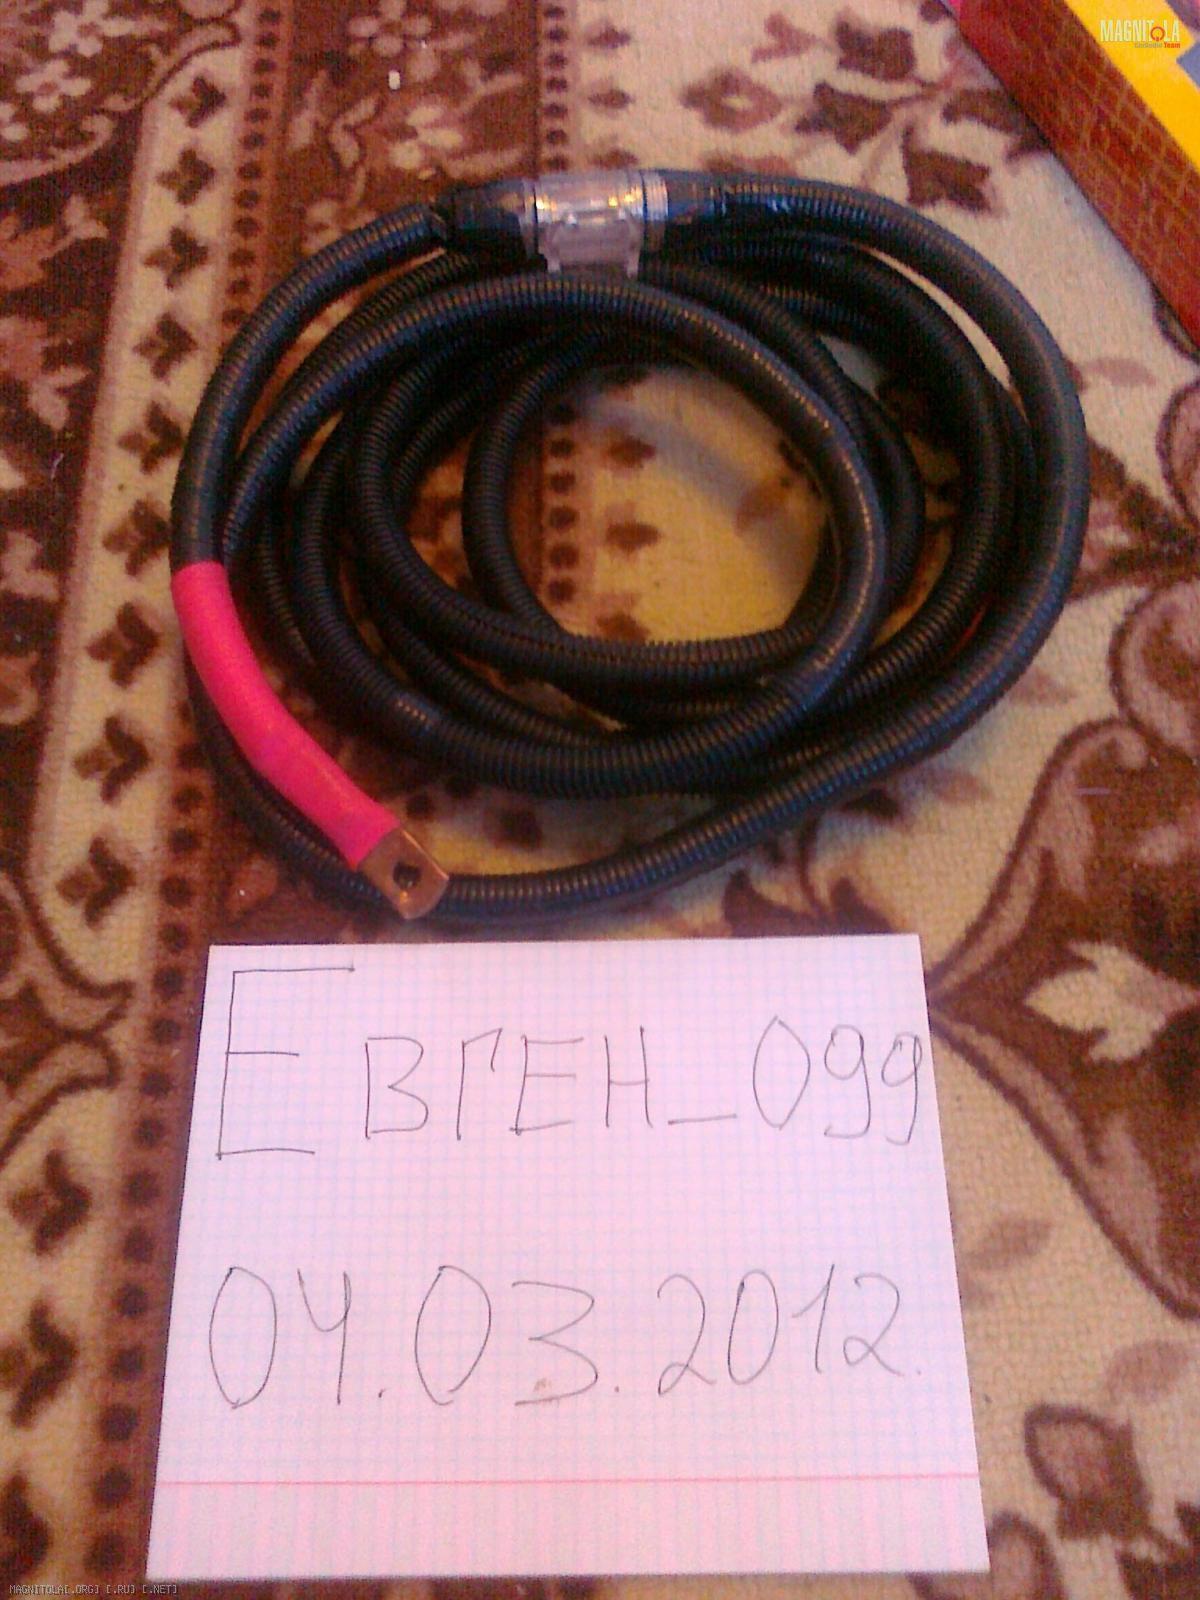 кабель апвкап 3х120/16-10.0